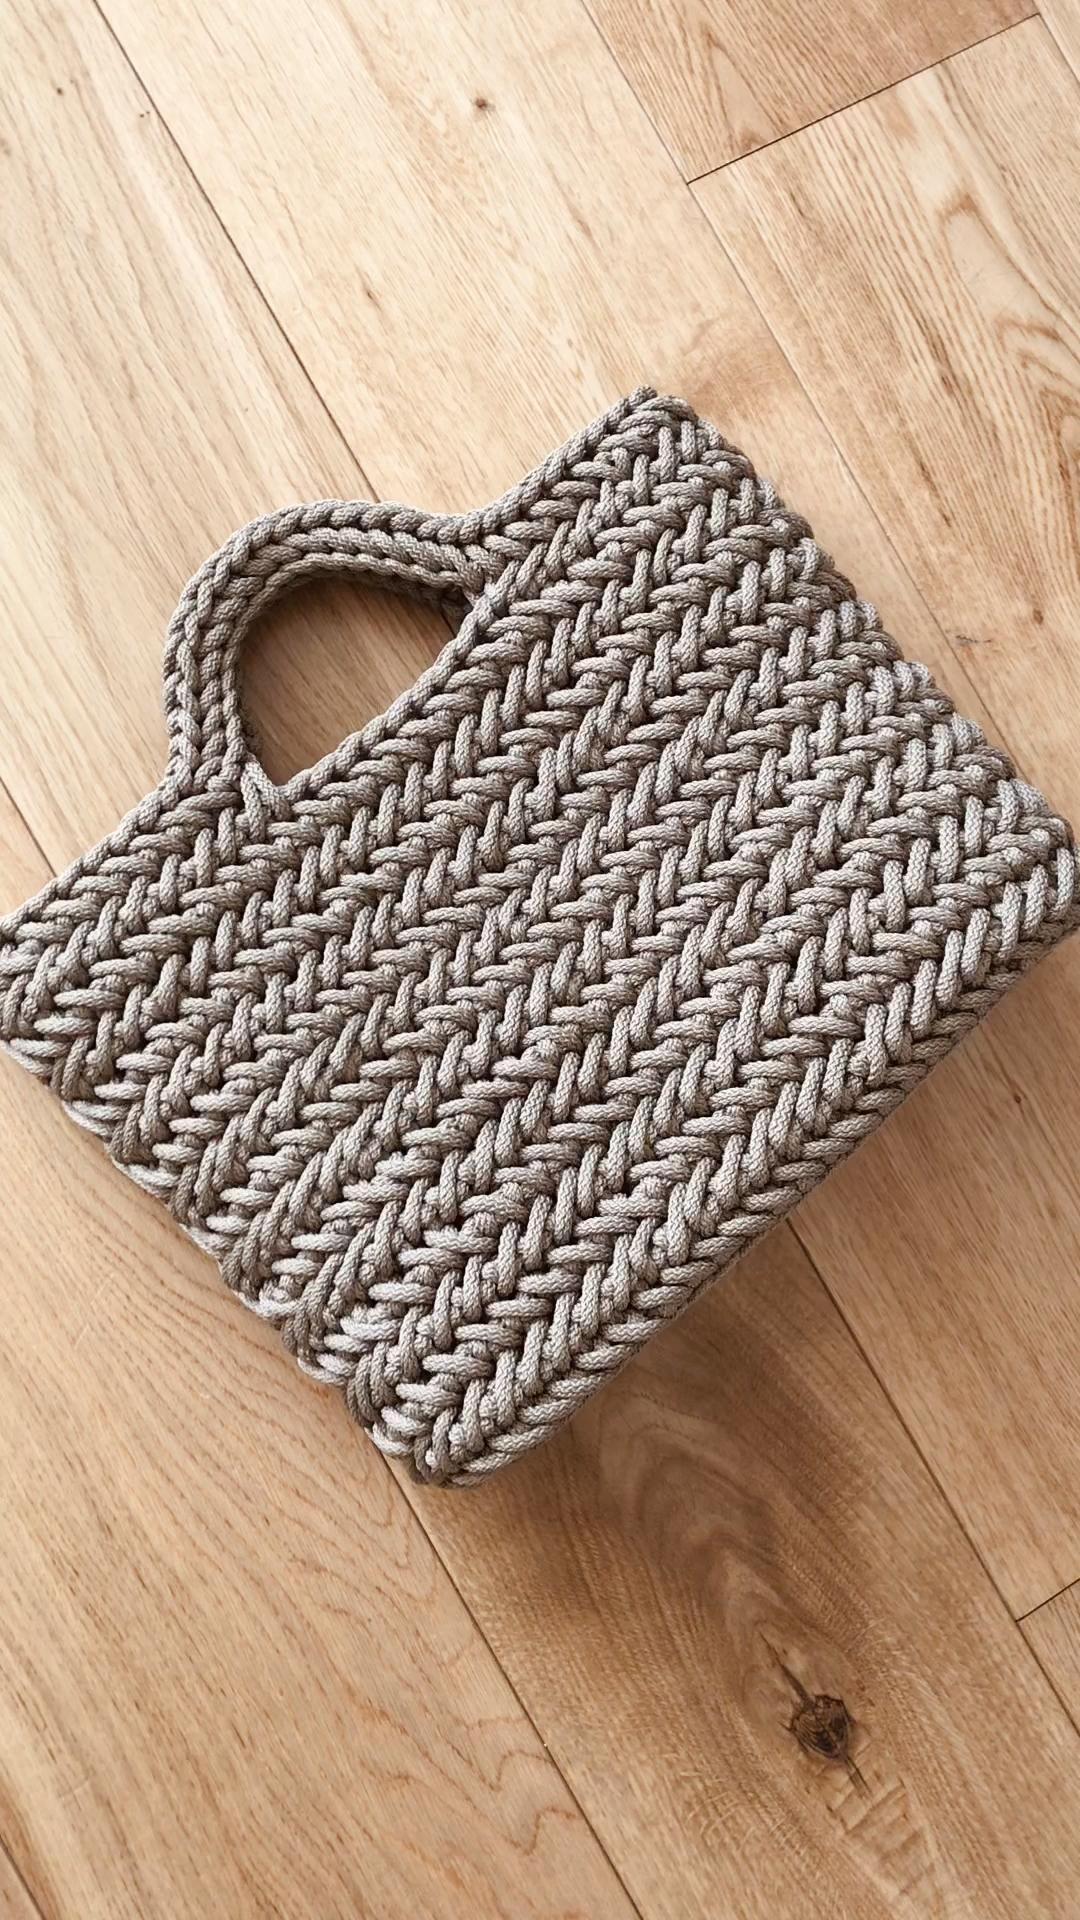 Photo of Herringbone Bag • Τσάντα Ψαροκοκκαλο